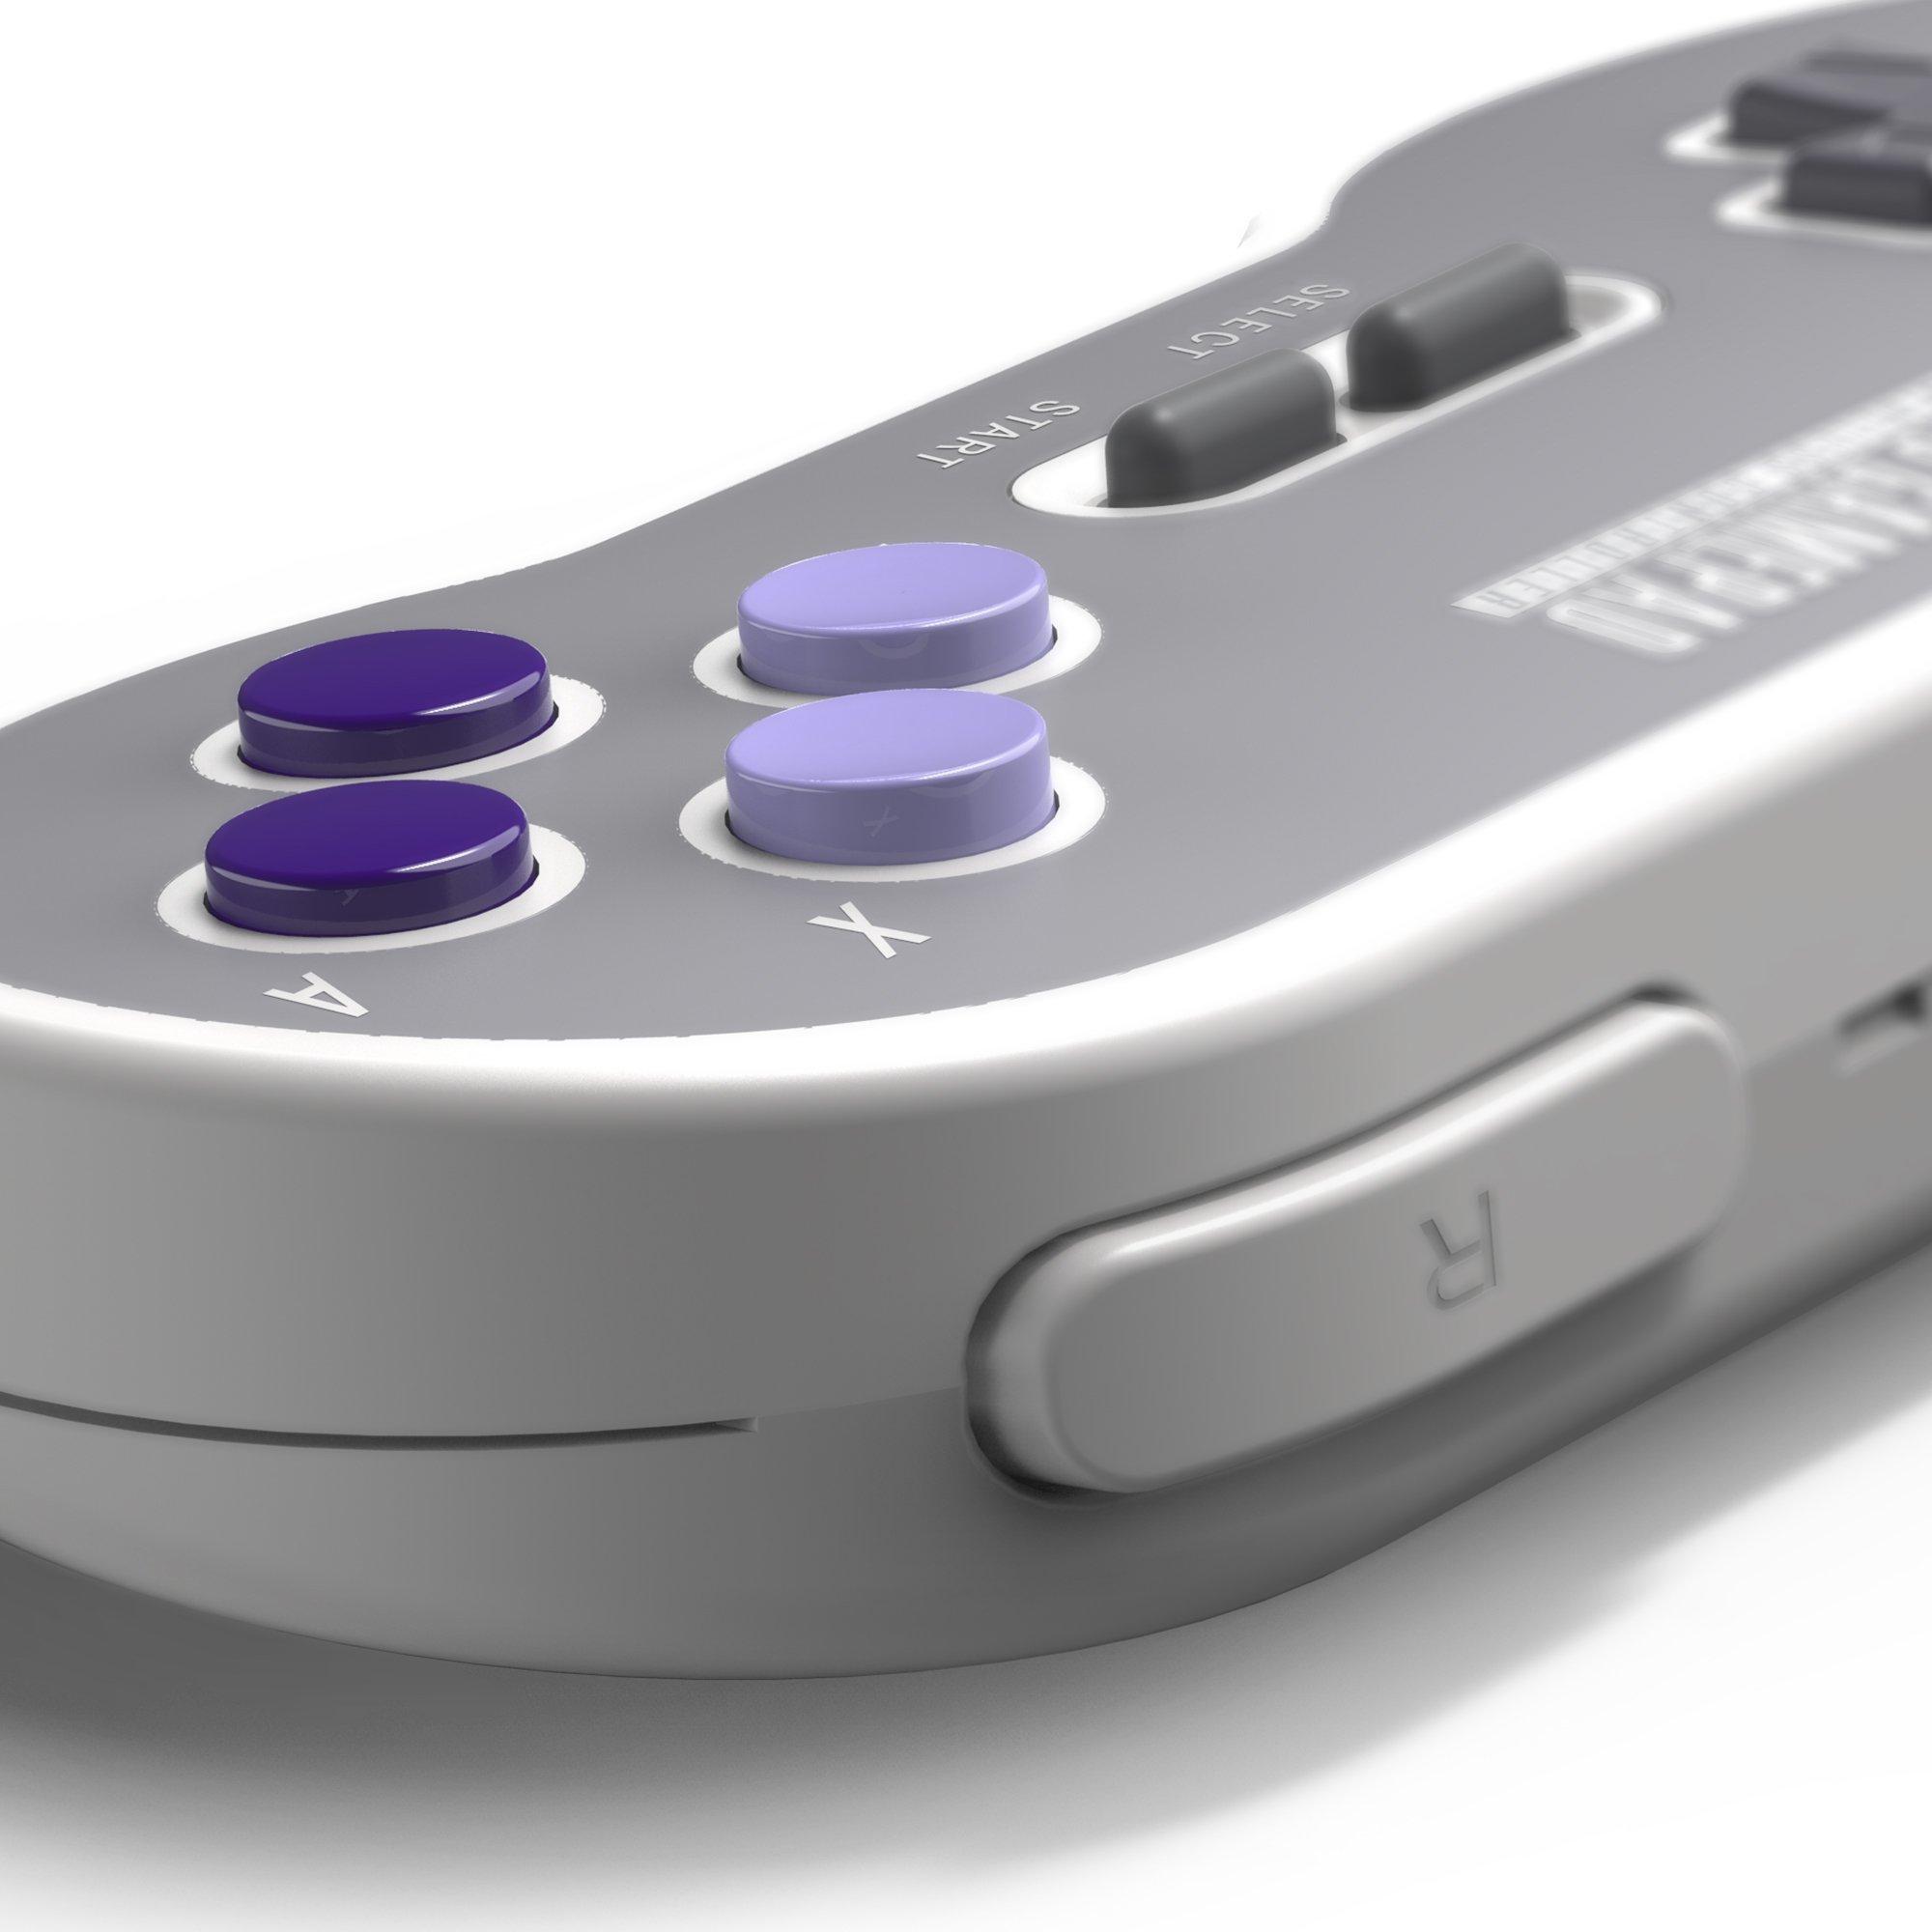 8Bitdo SN30 2.4G Wireless Controller for SNES Classic Edition [nintendo_super_NES] by 8Bitdo (Image #6)